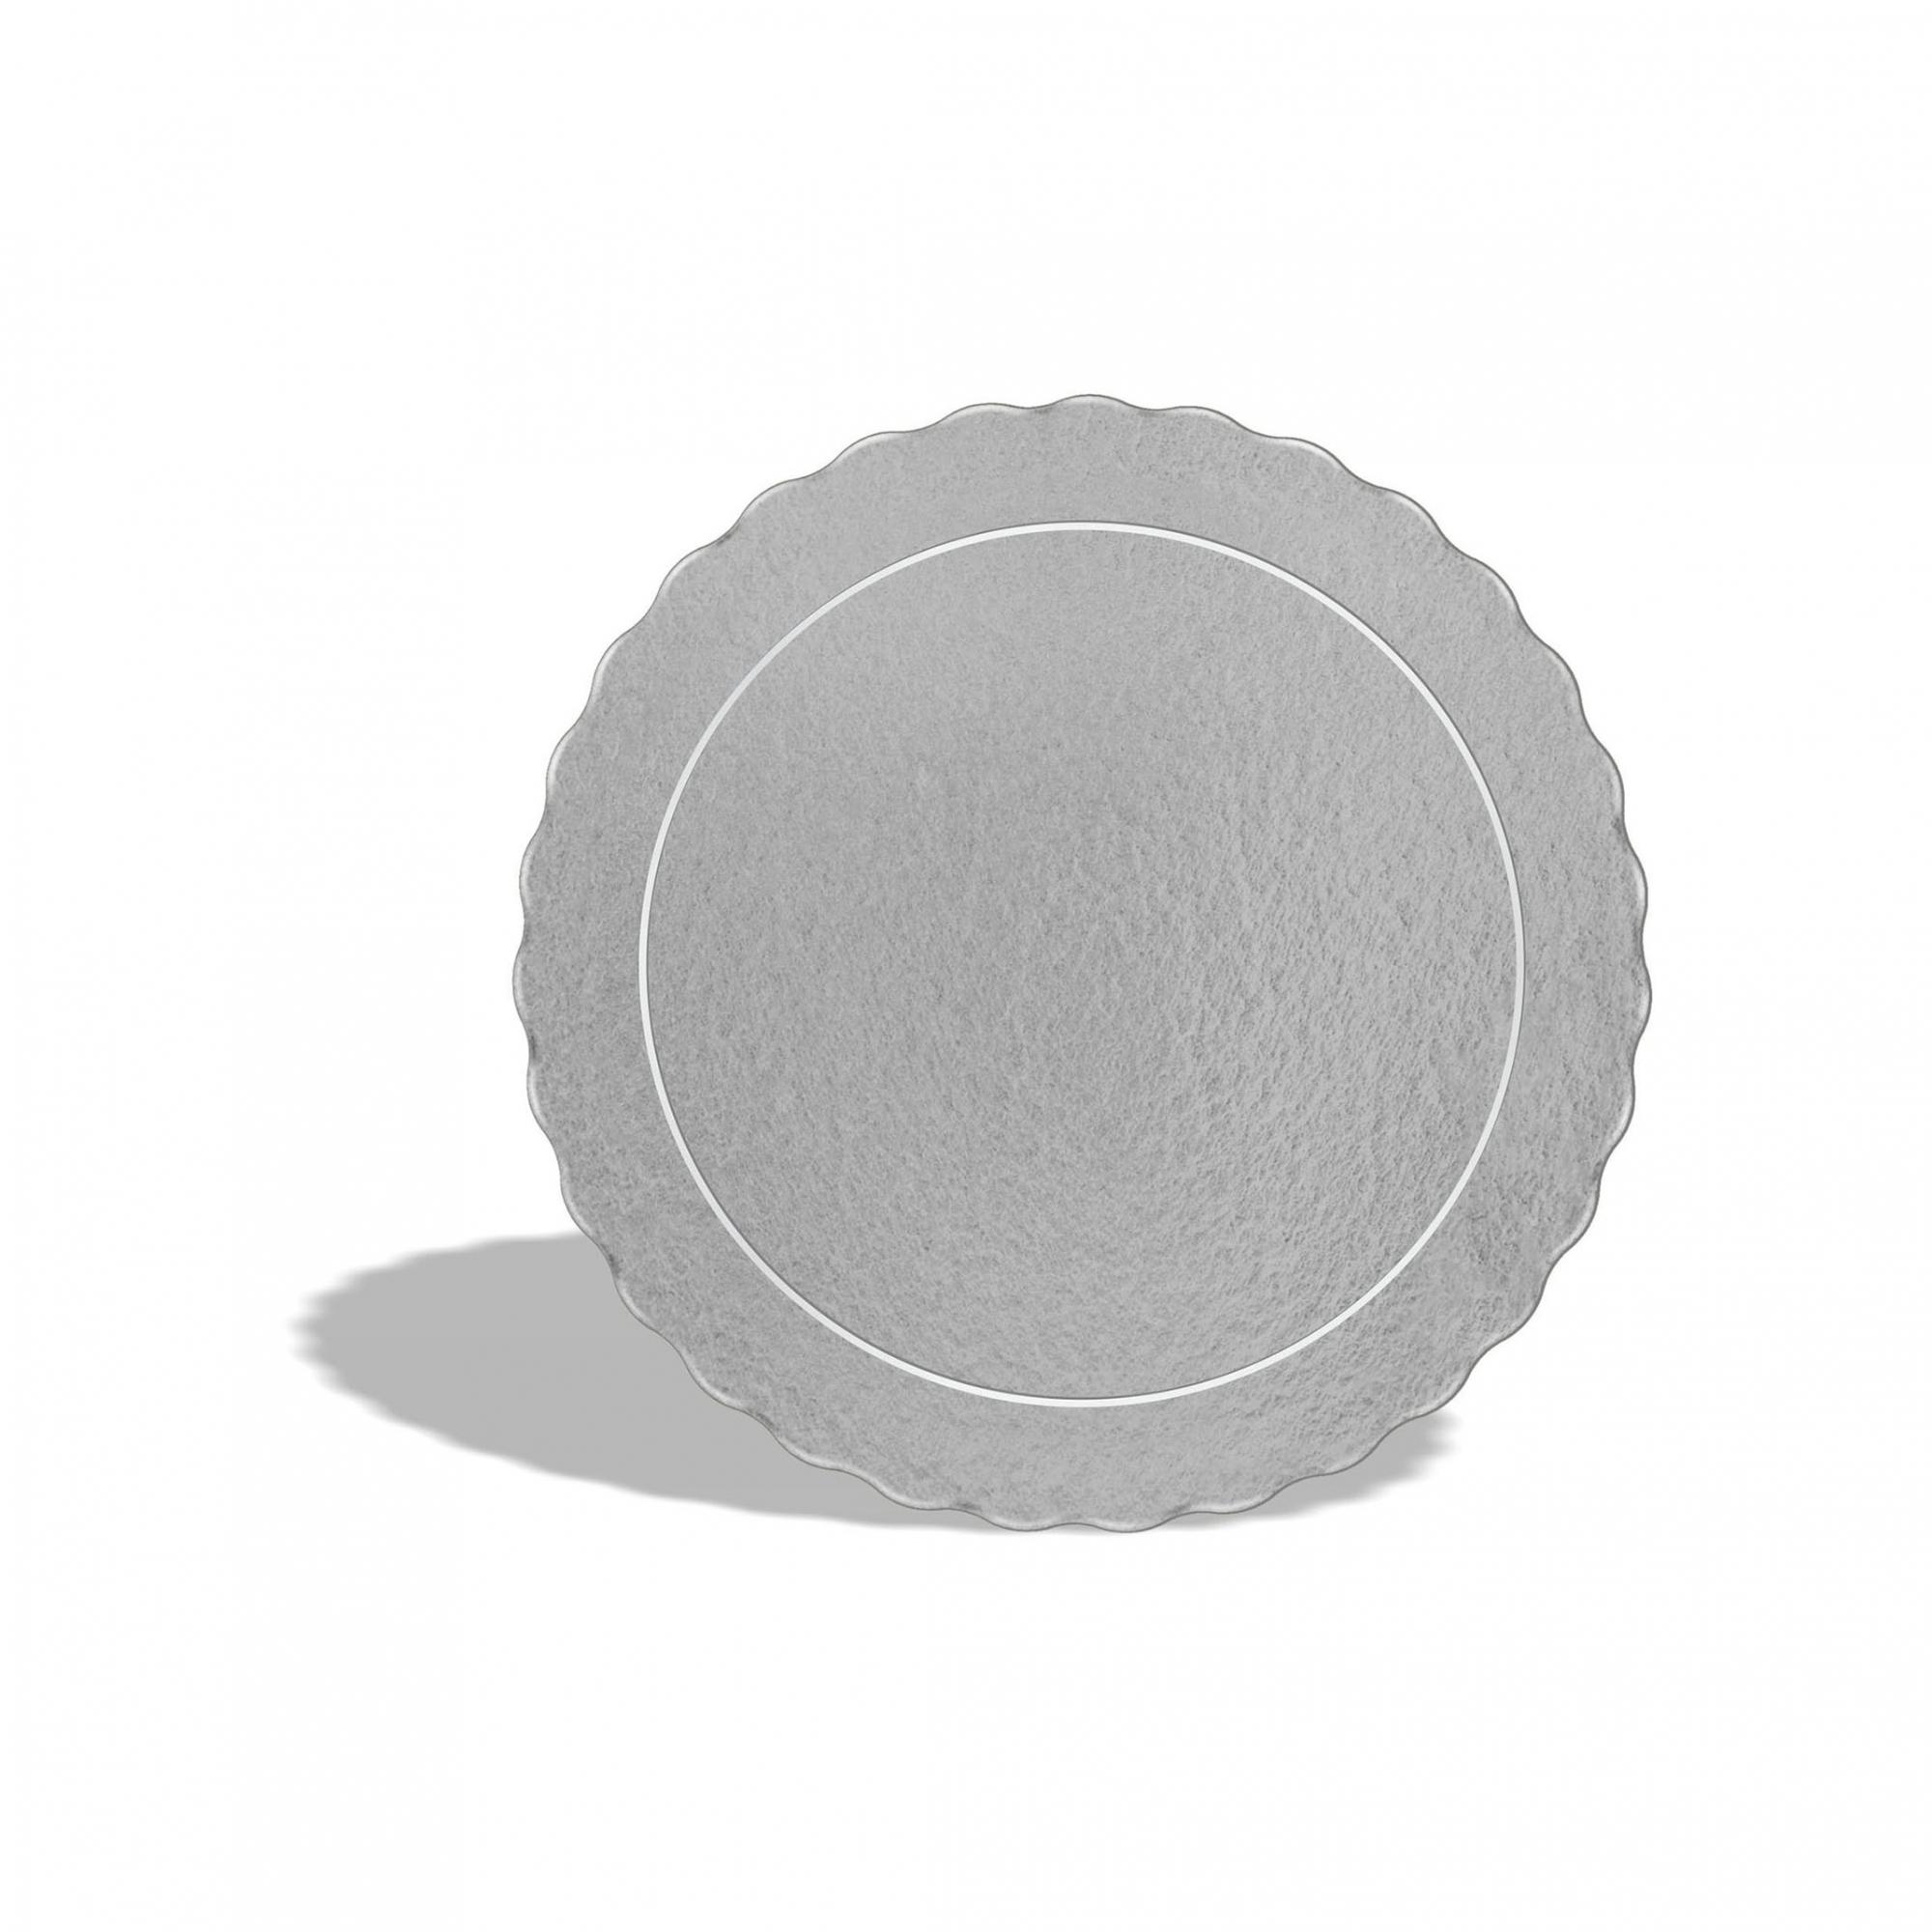 50 Bases Laminadas, Suporte P/ Bolo, Cake Board, 23cm - Prata